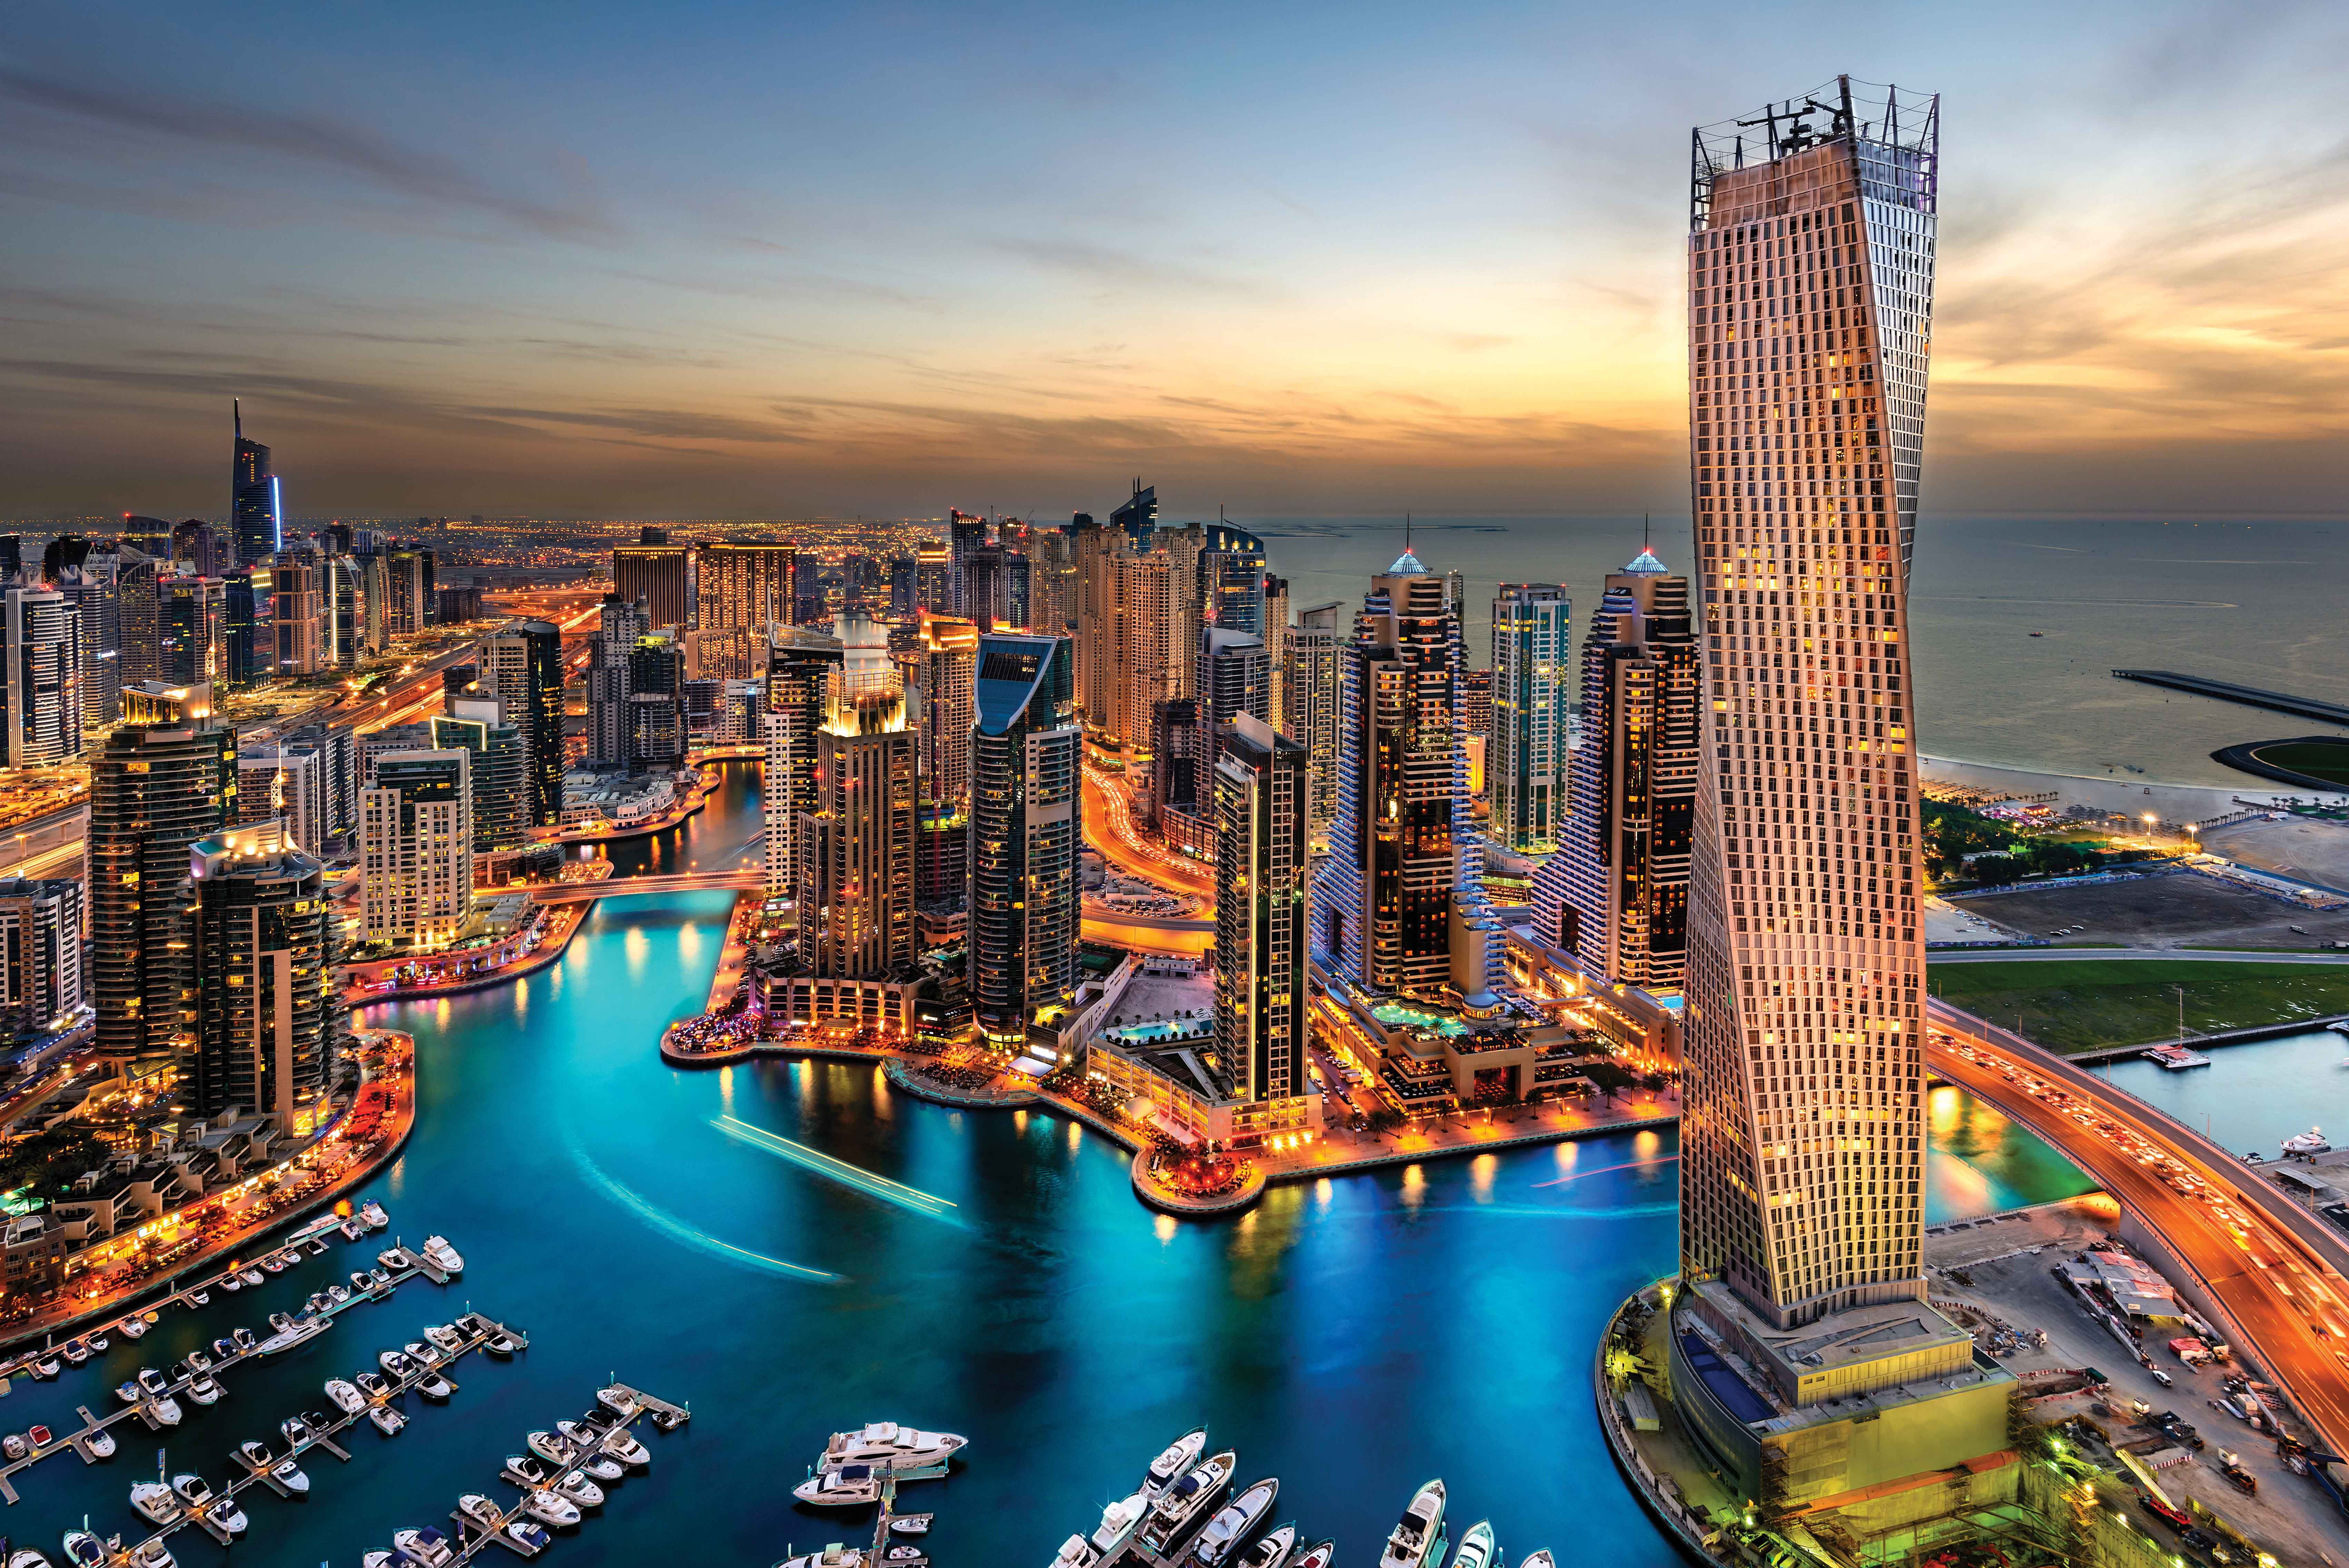 Dubai Skyscrapers Night 4K Ultra HD Wallpaper